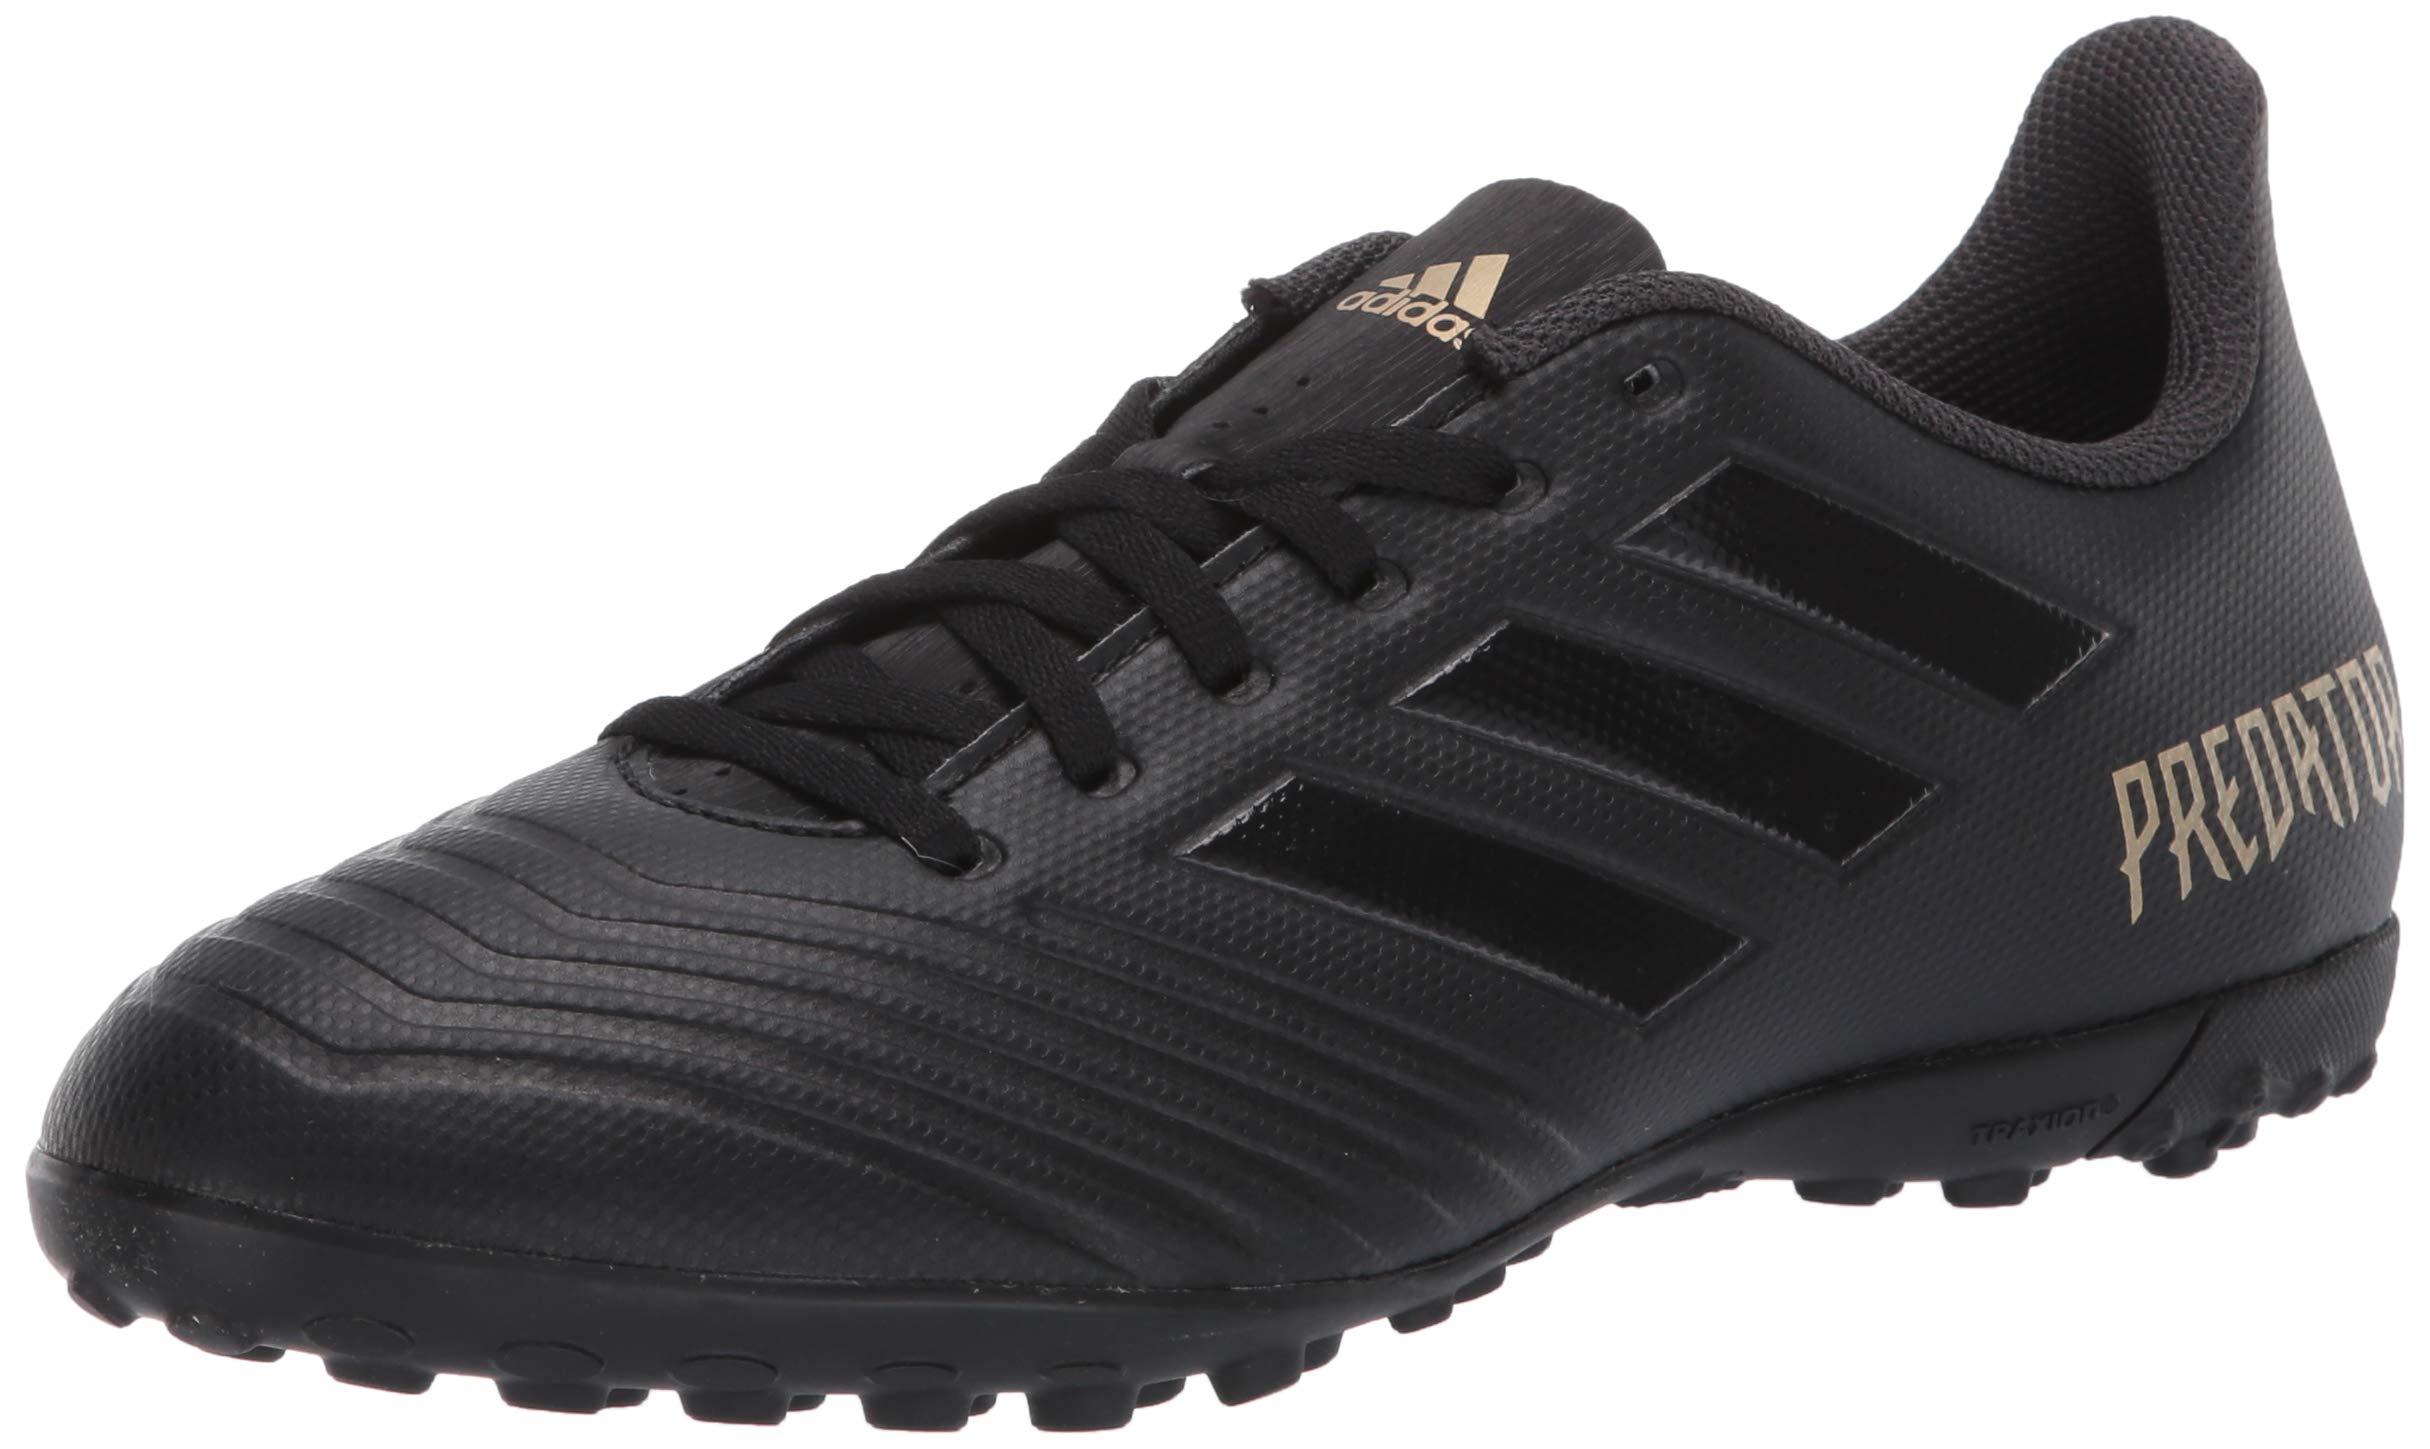 adidas Predator Soccer Utility Black